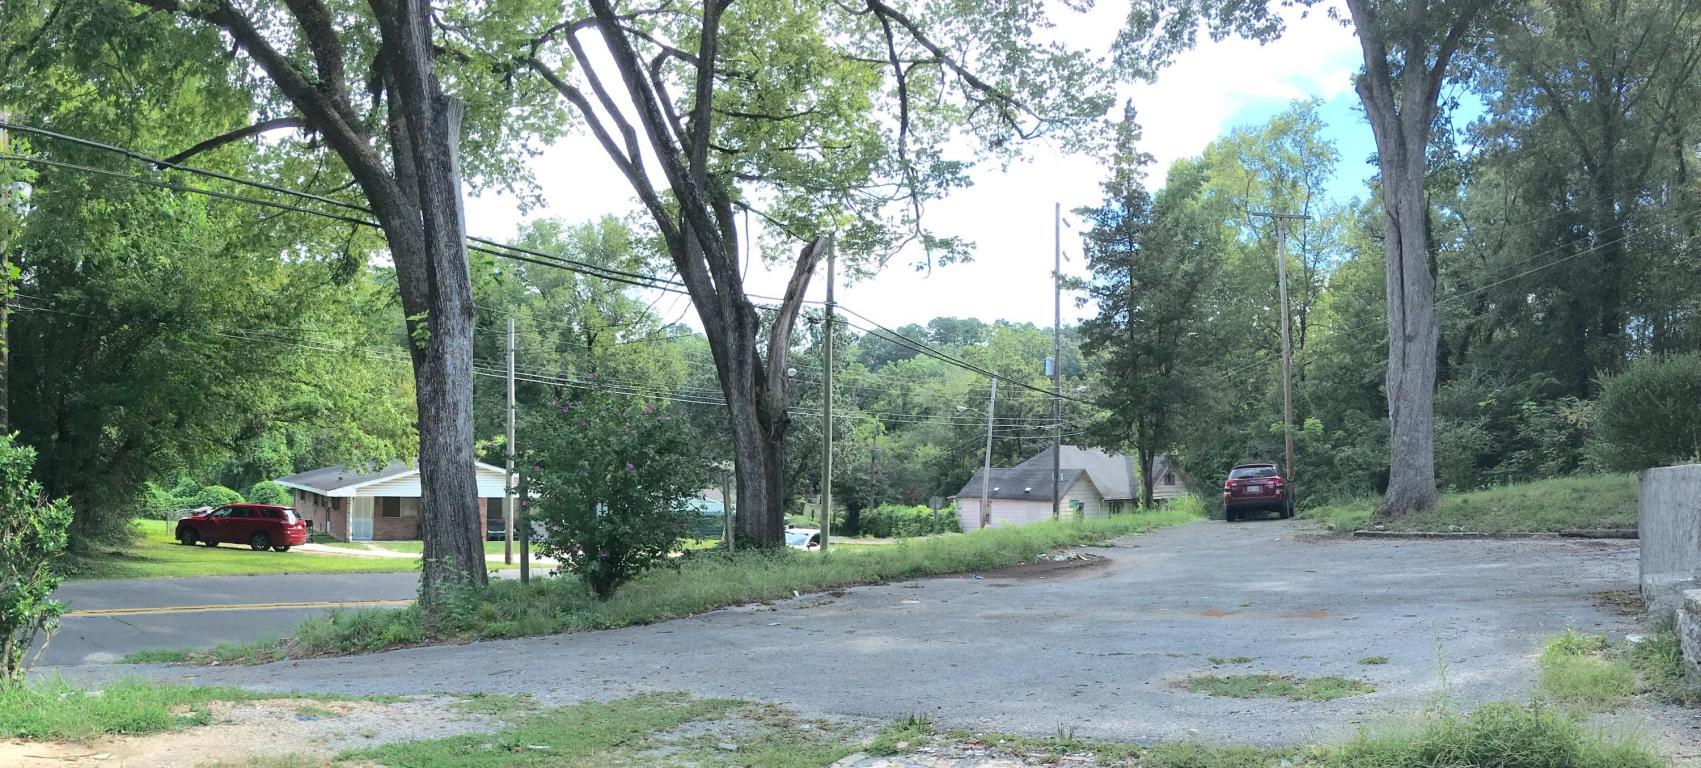 406 Shallowford Rd Rd, Chattanooga, TN 37411